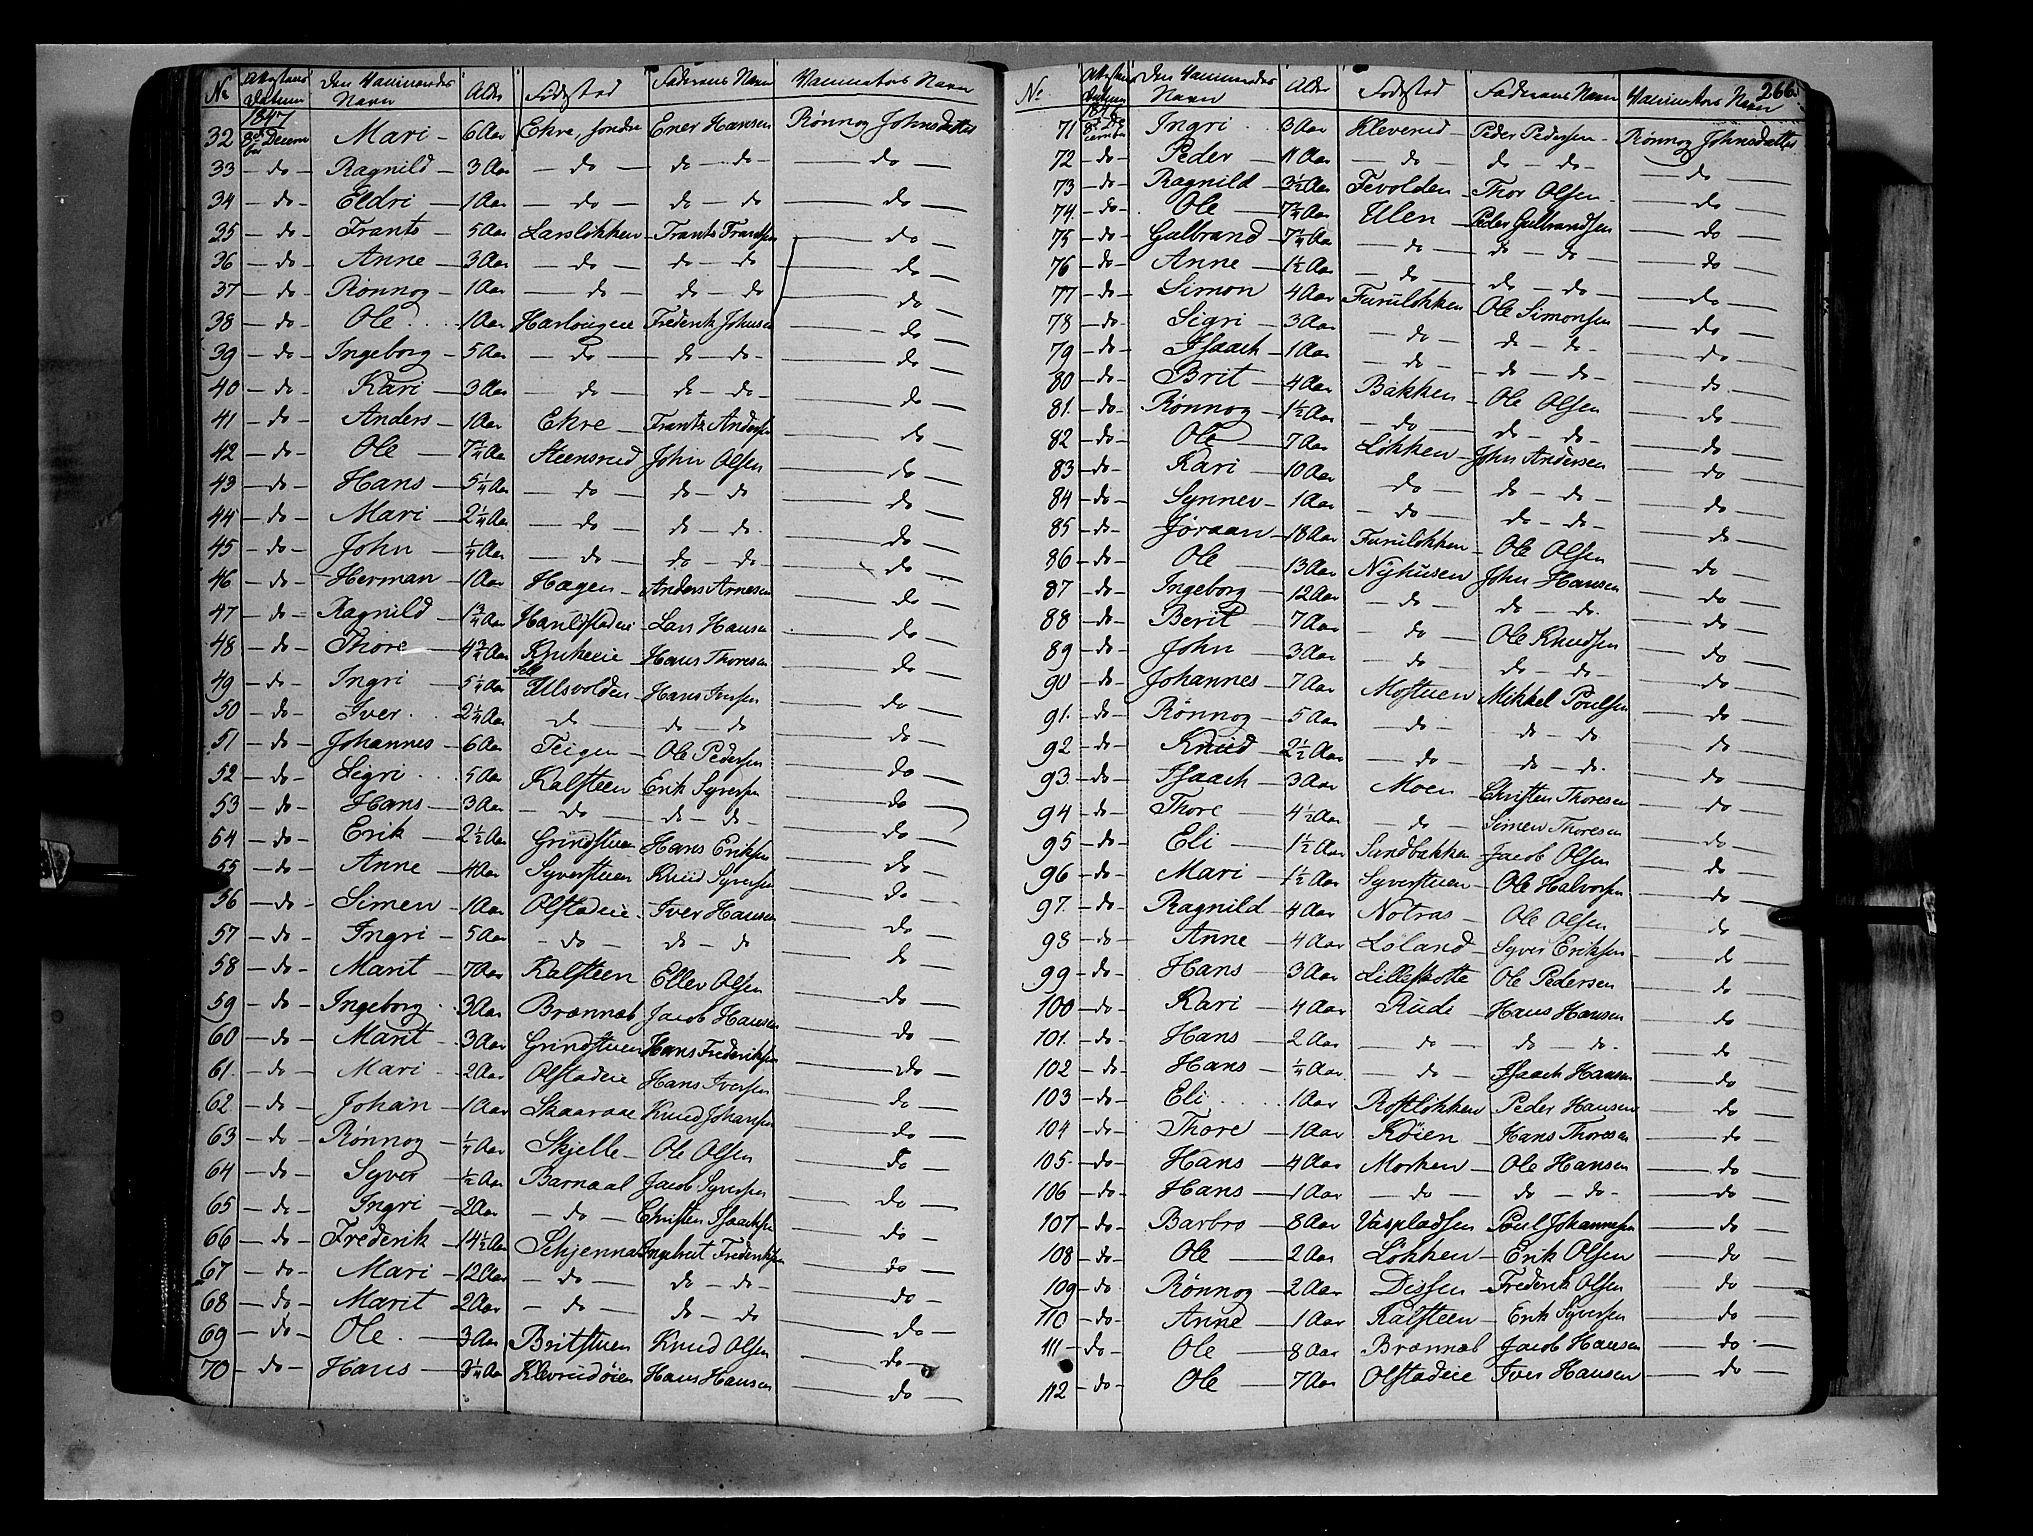 SAH, Vågå prestekontor, Ministerialbok nr. 5 /1, 1842-1856, s. 266